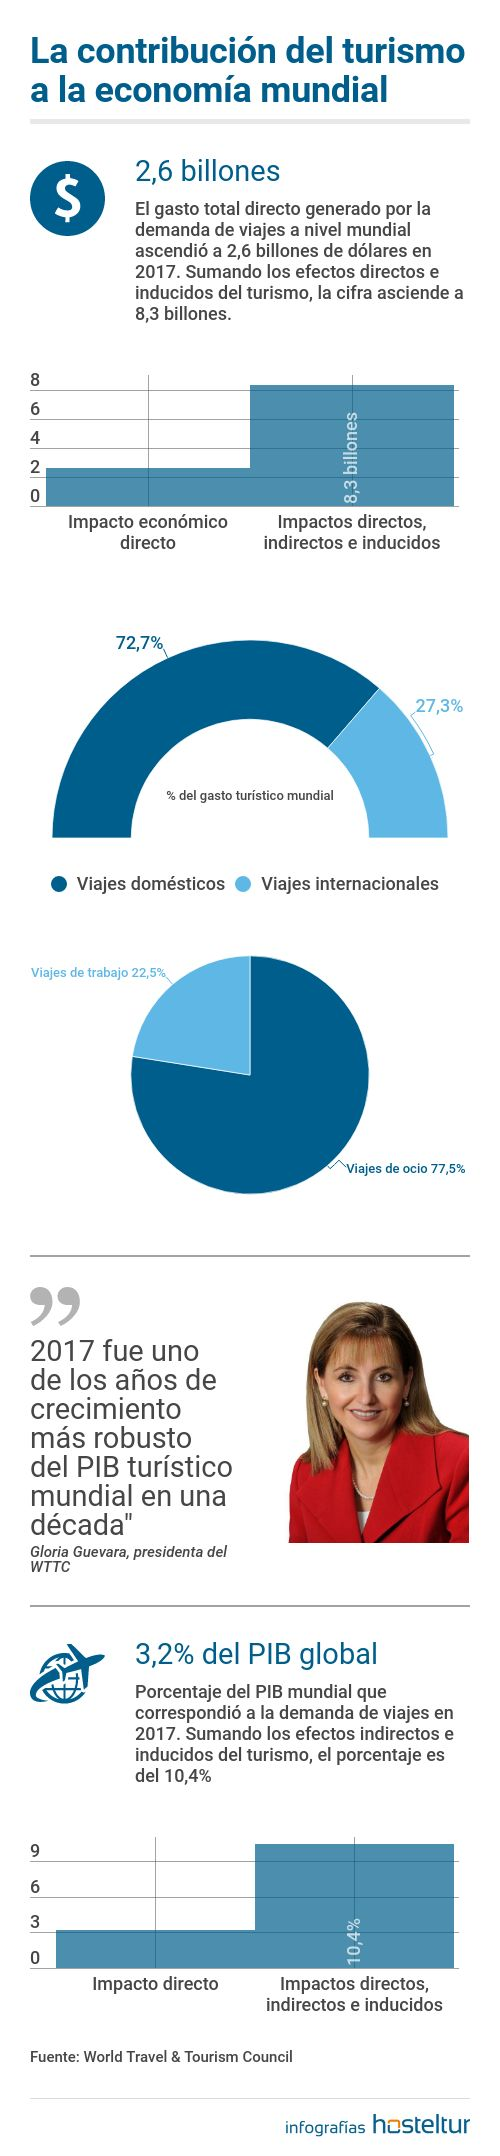 wttc-2017-pib-turismo